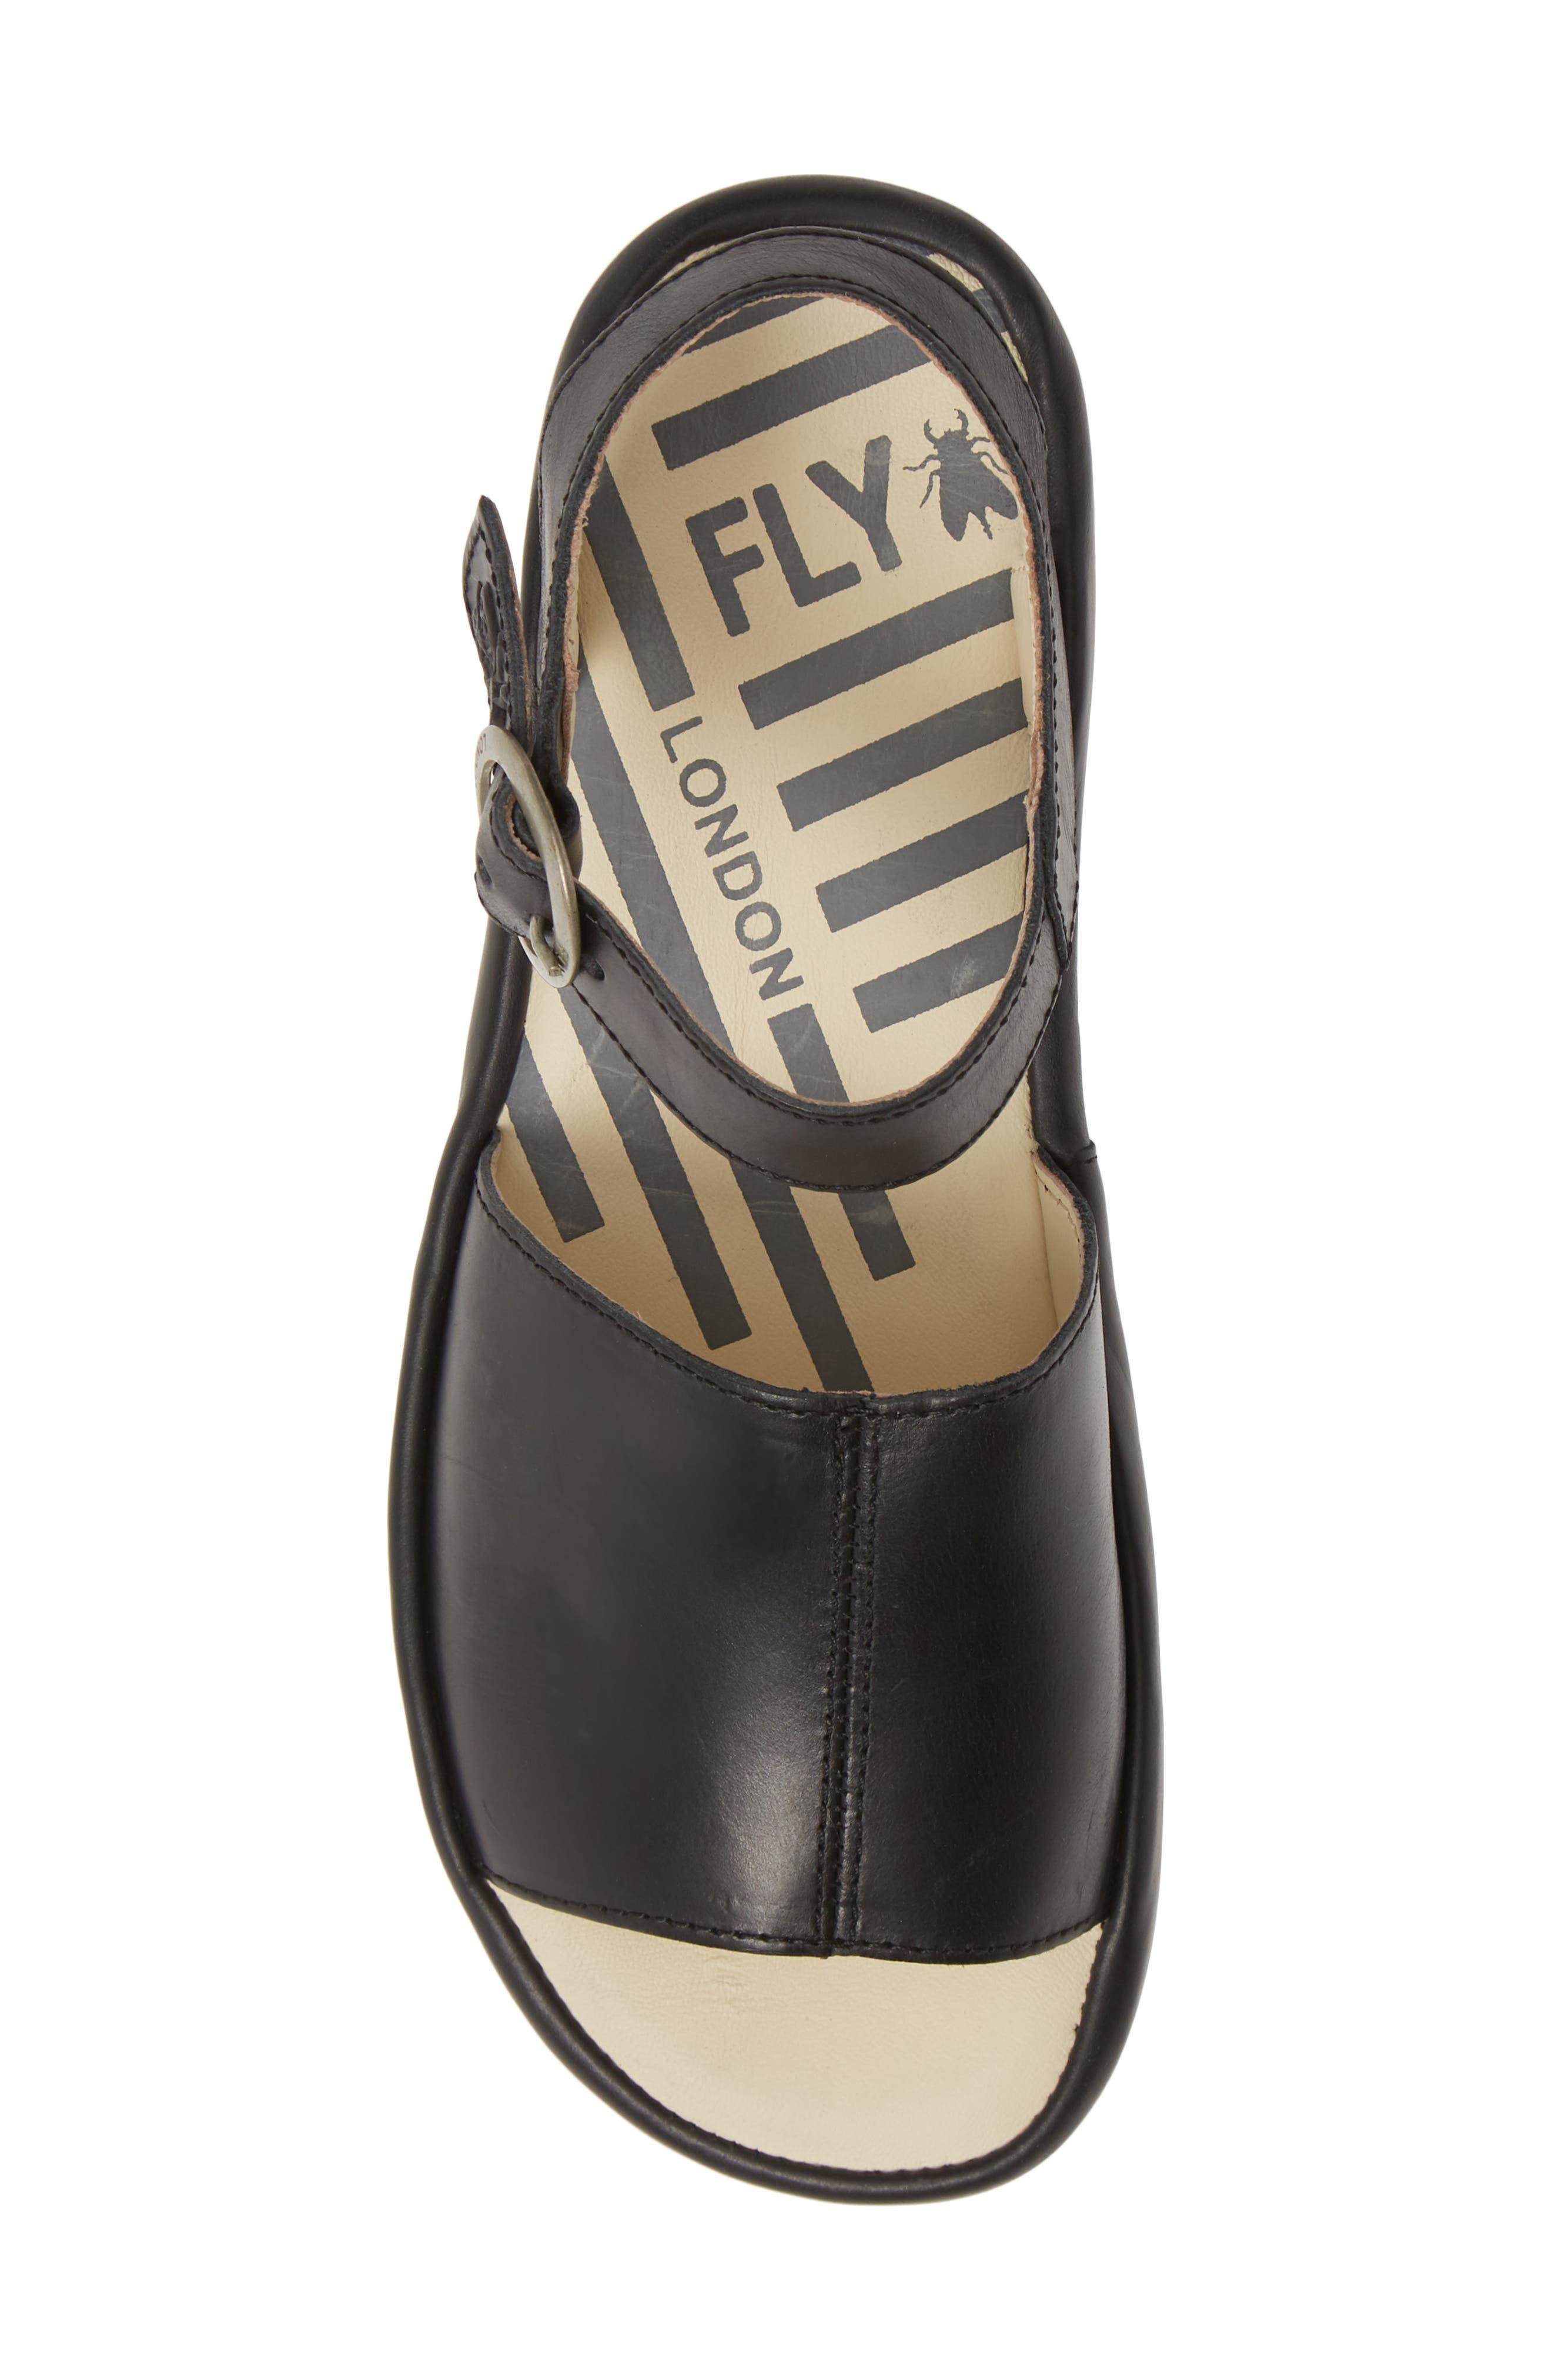 FLY LONDON, Bano Platform Sandal, Alternate thumbnail 5, color, BLACK LEATHER